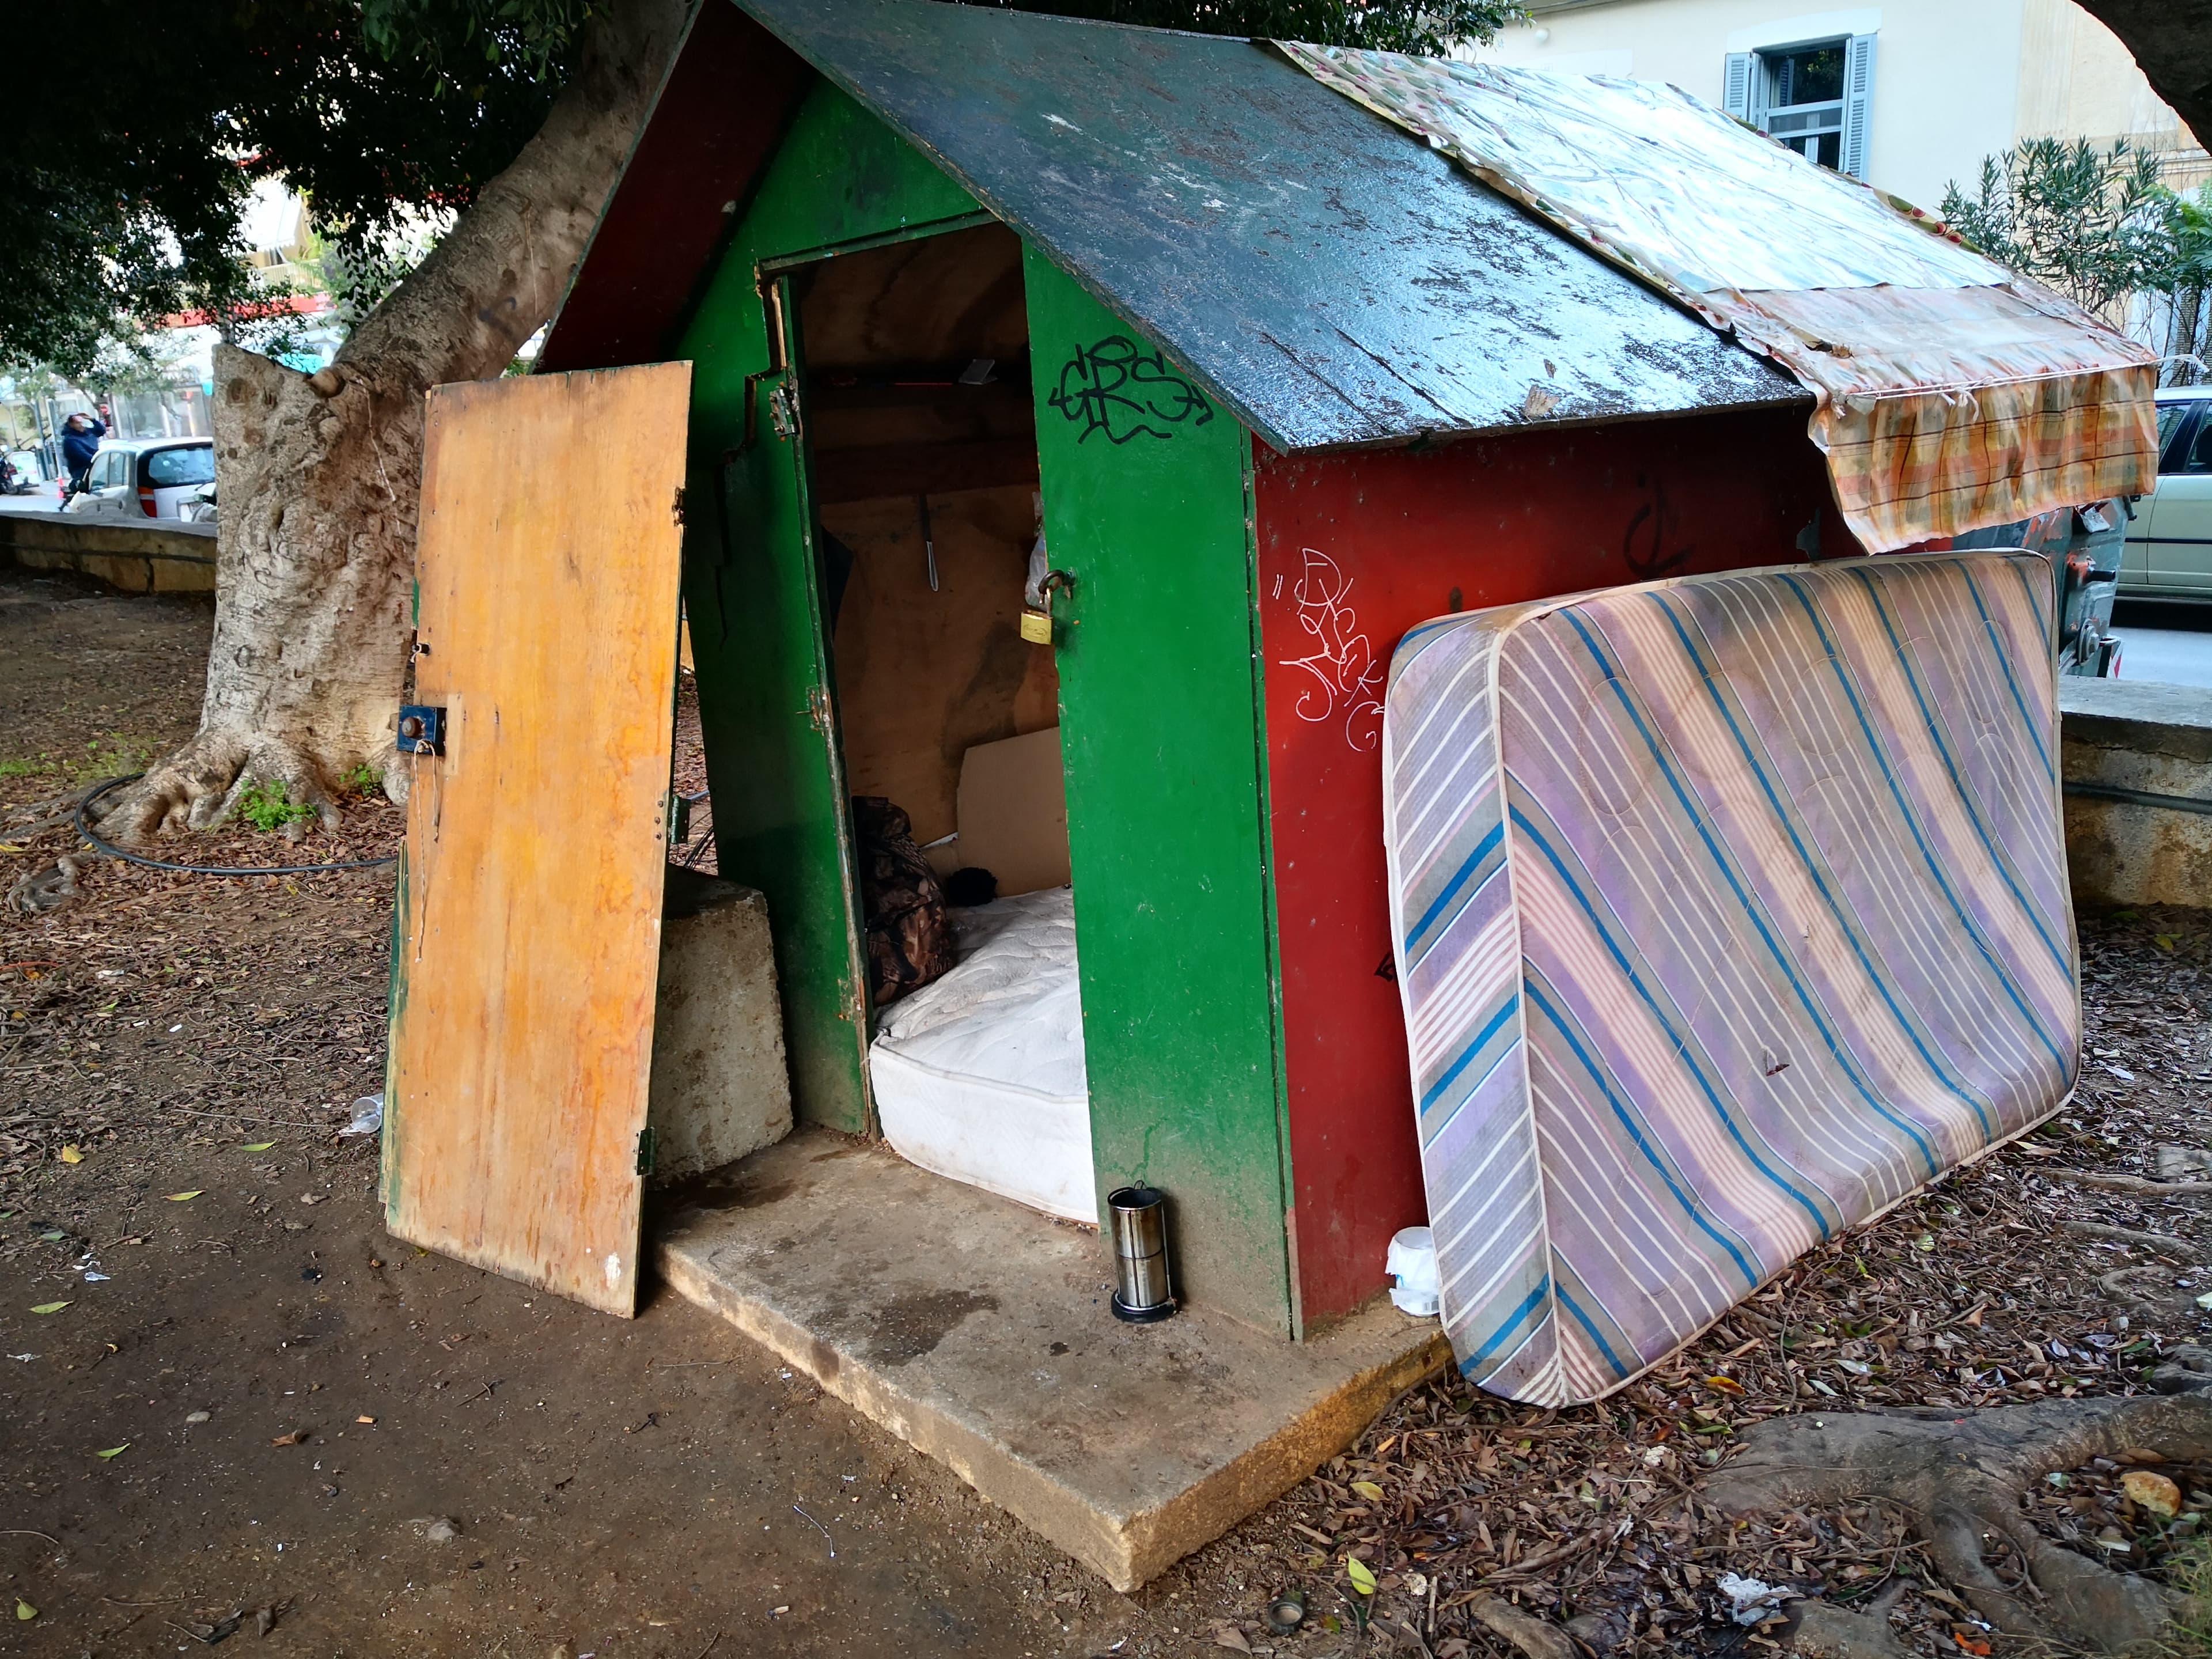 b3794ac964e Έκαναν... ακατάλληλο για παιδιά πάρκο των Χανίων (φωτο) - Flashnews.gr